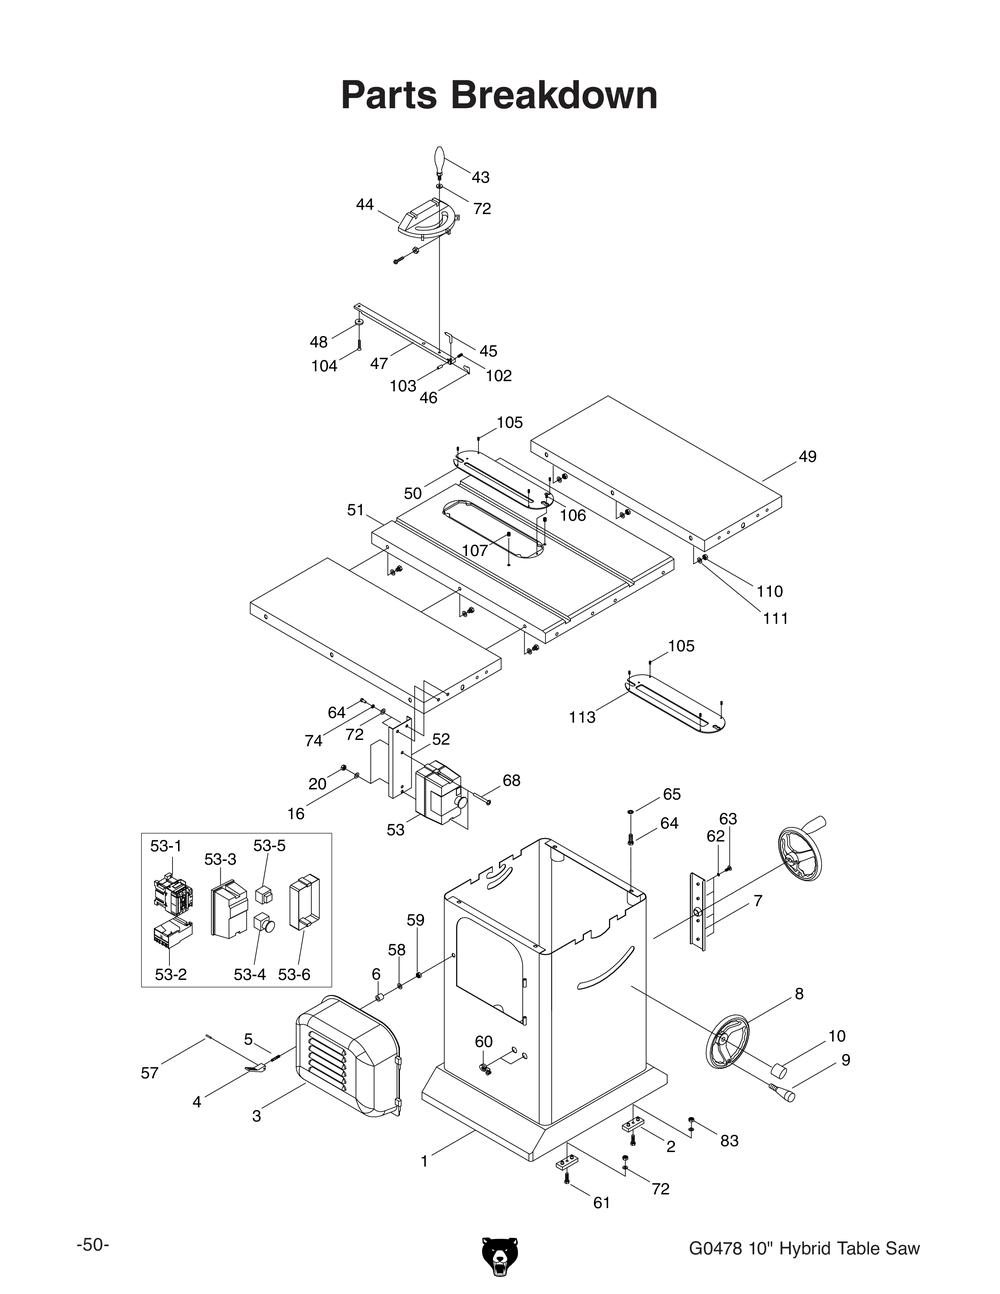 Sawstop Wiring Diagram Ingersoll Rand Wiring Diagram